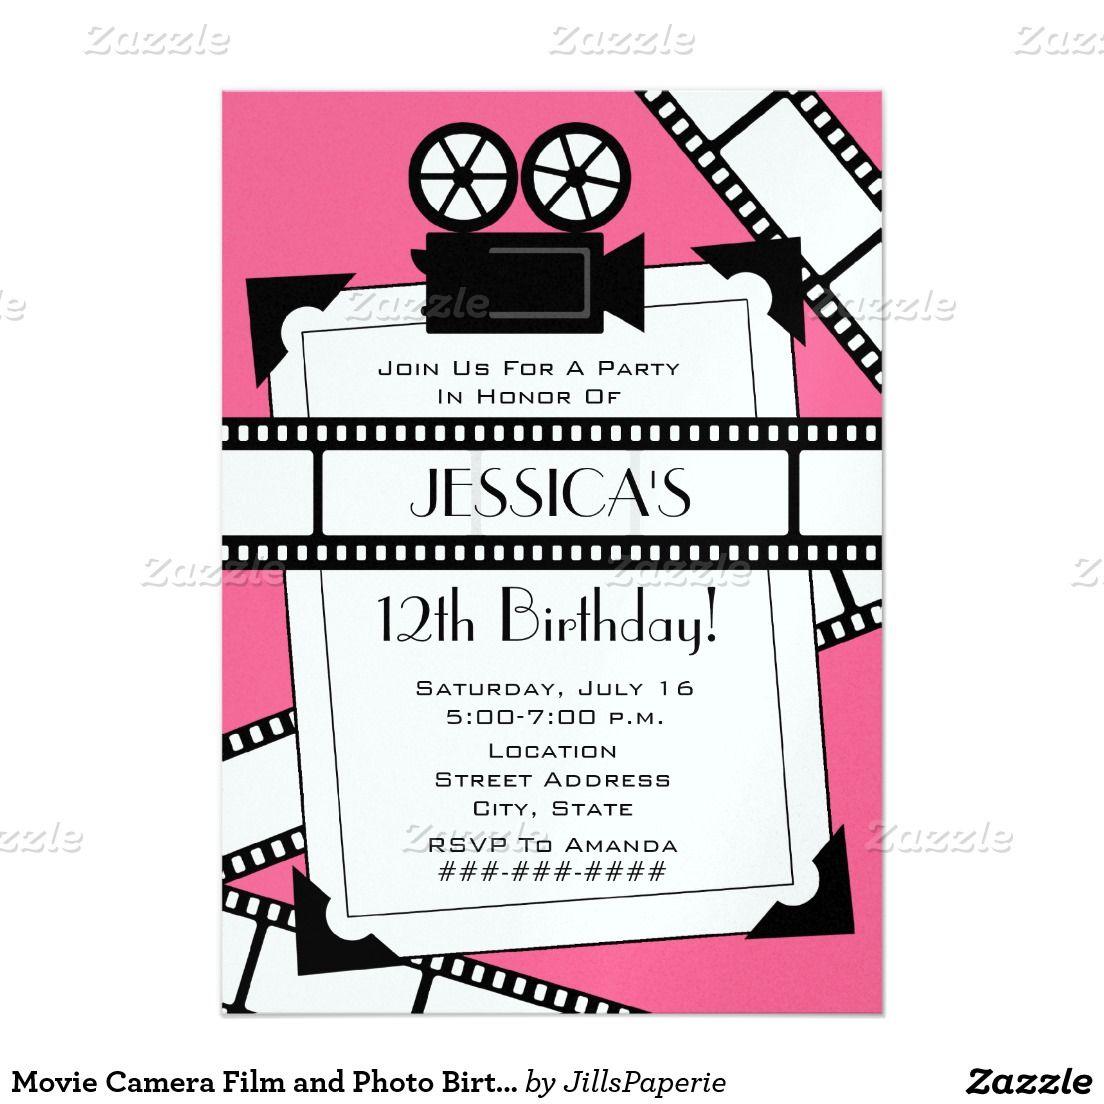 Movie Camera Film and Photo Birthday Party Invite | Birthday Ideas ...